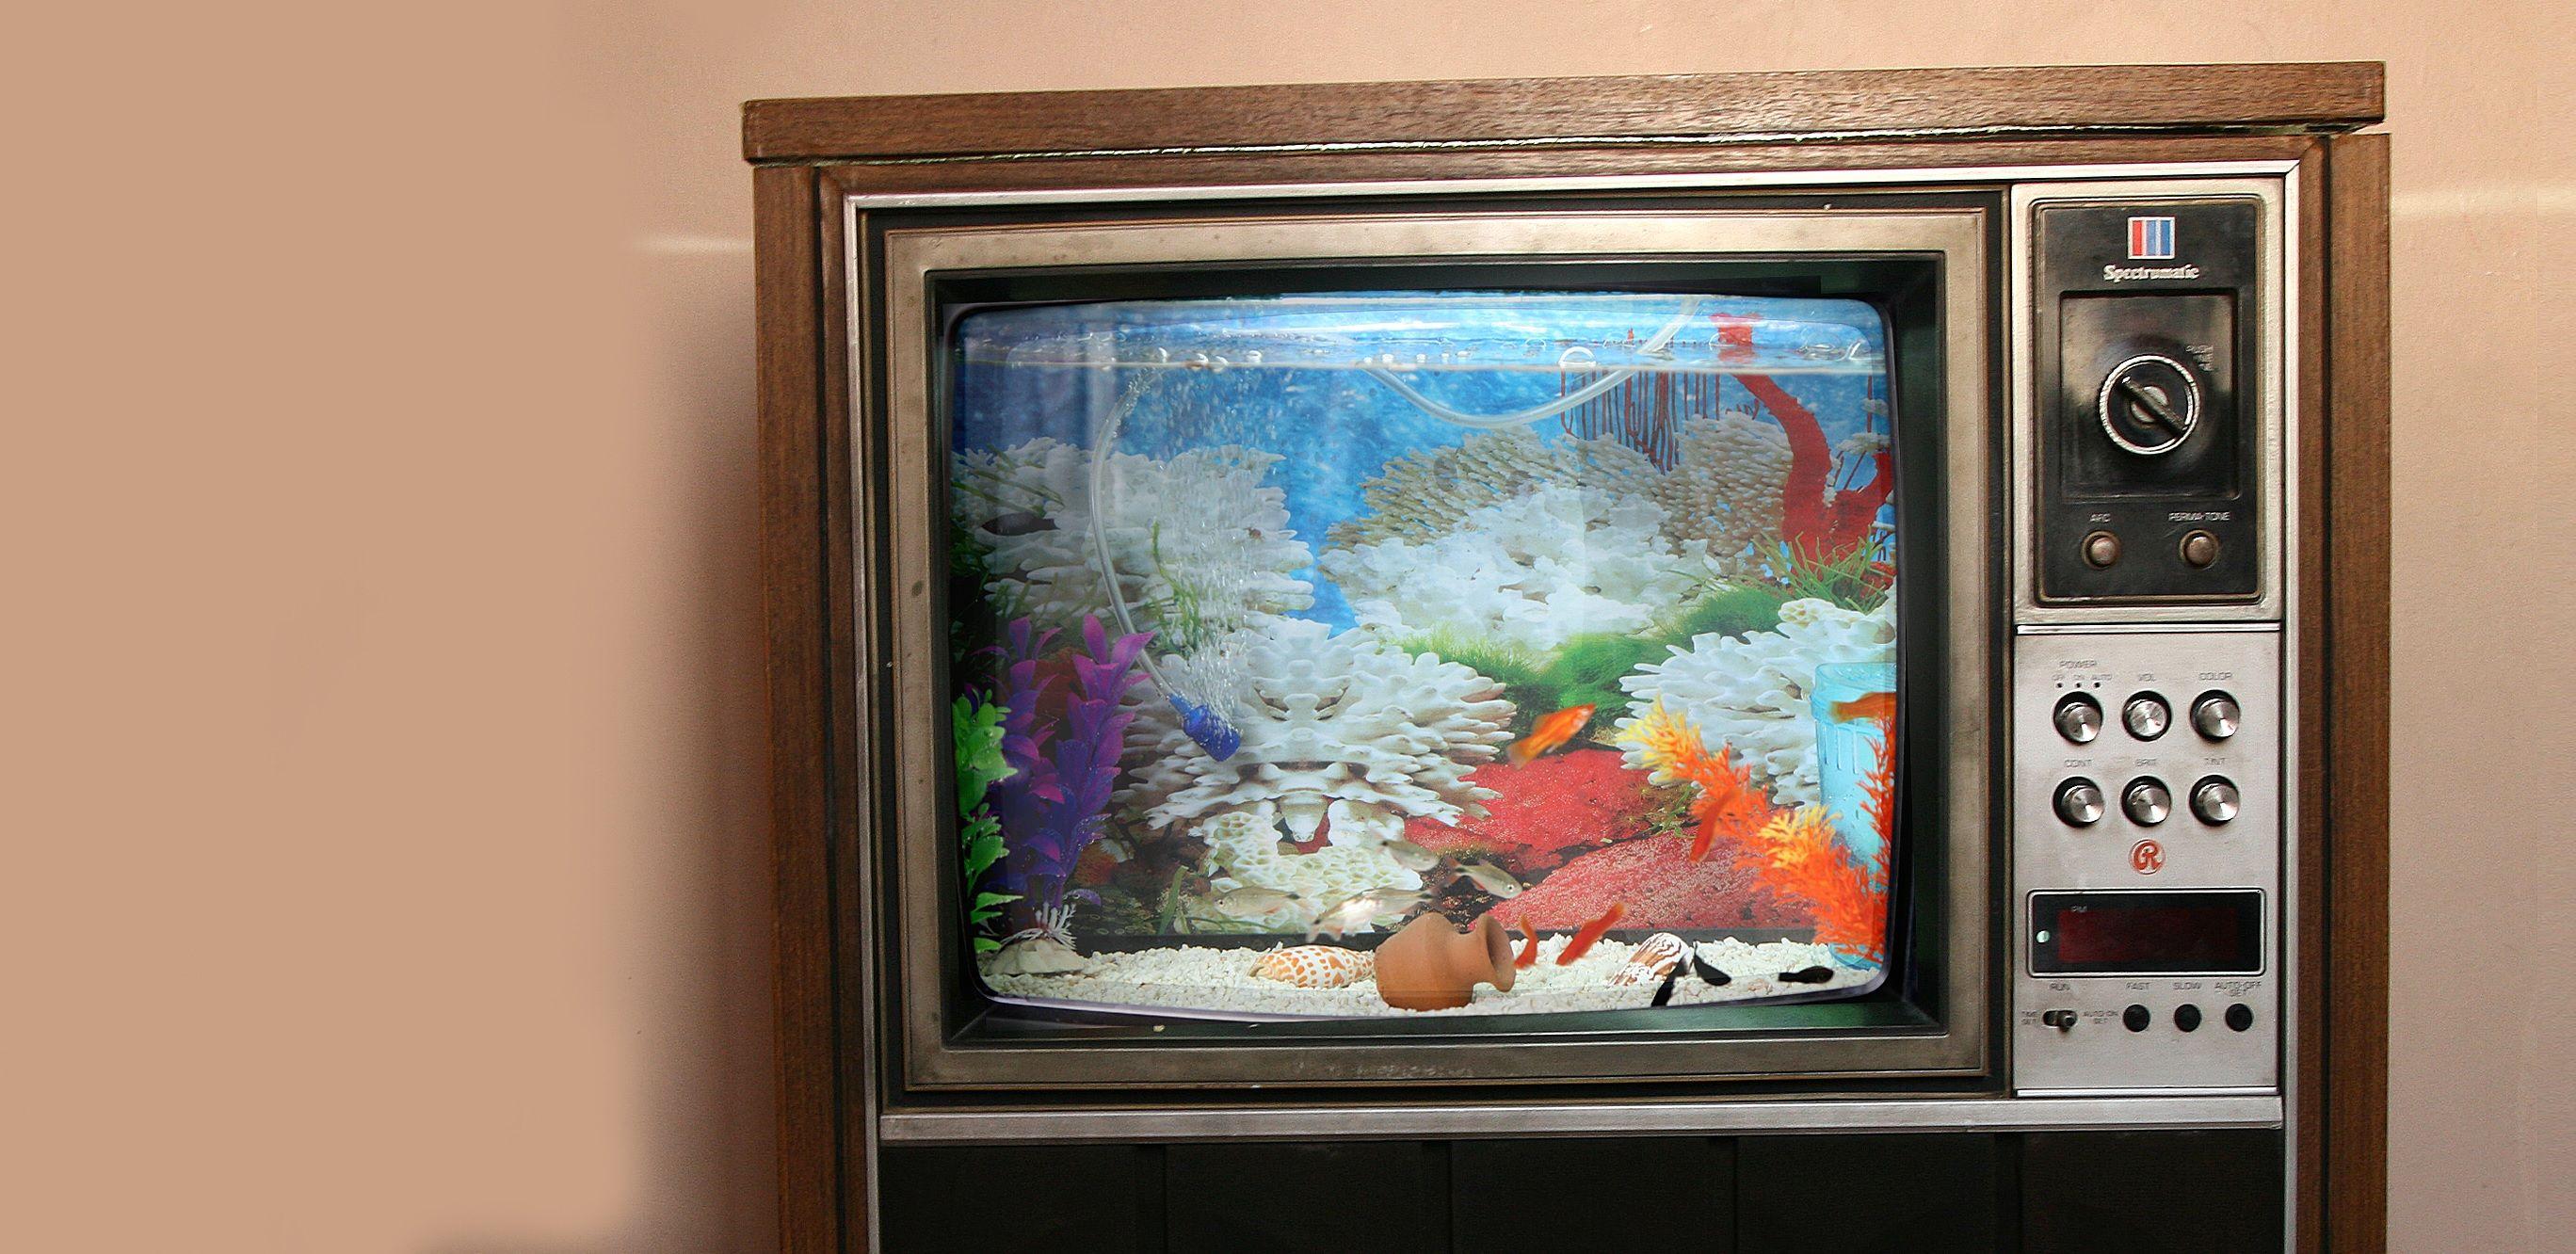 18 magnificent aquarium designs for your home home